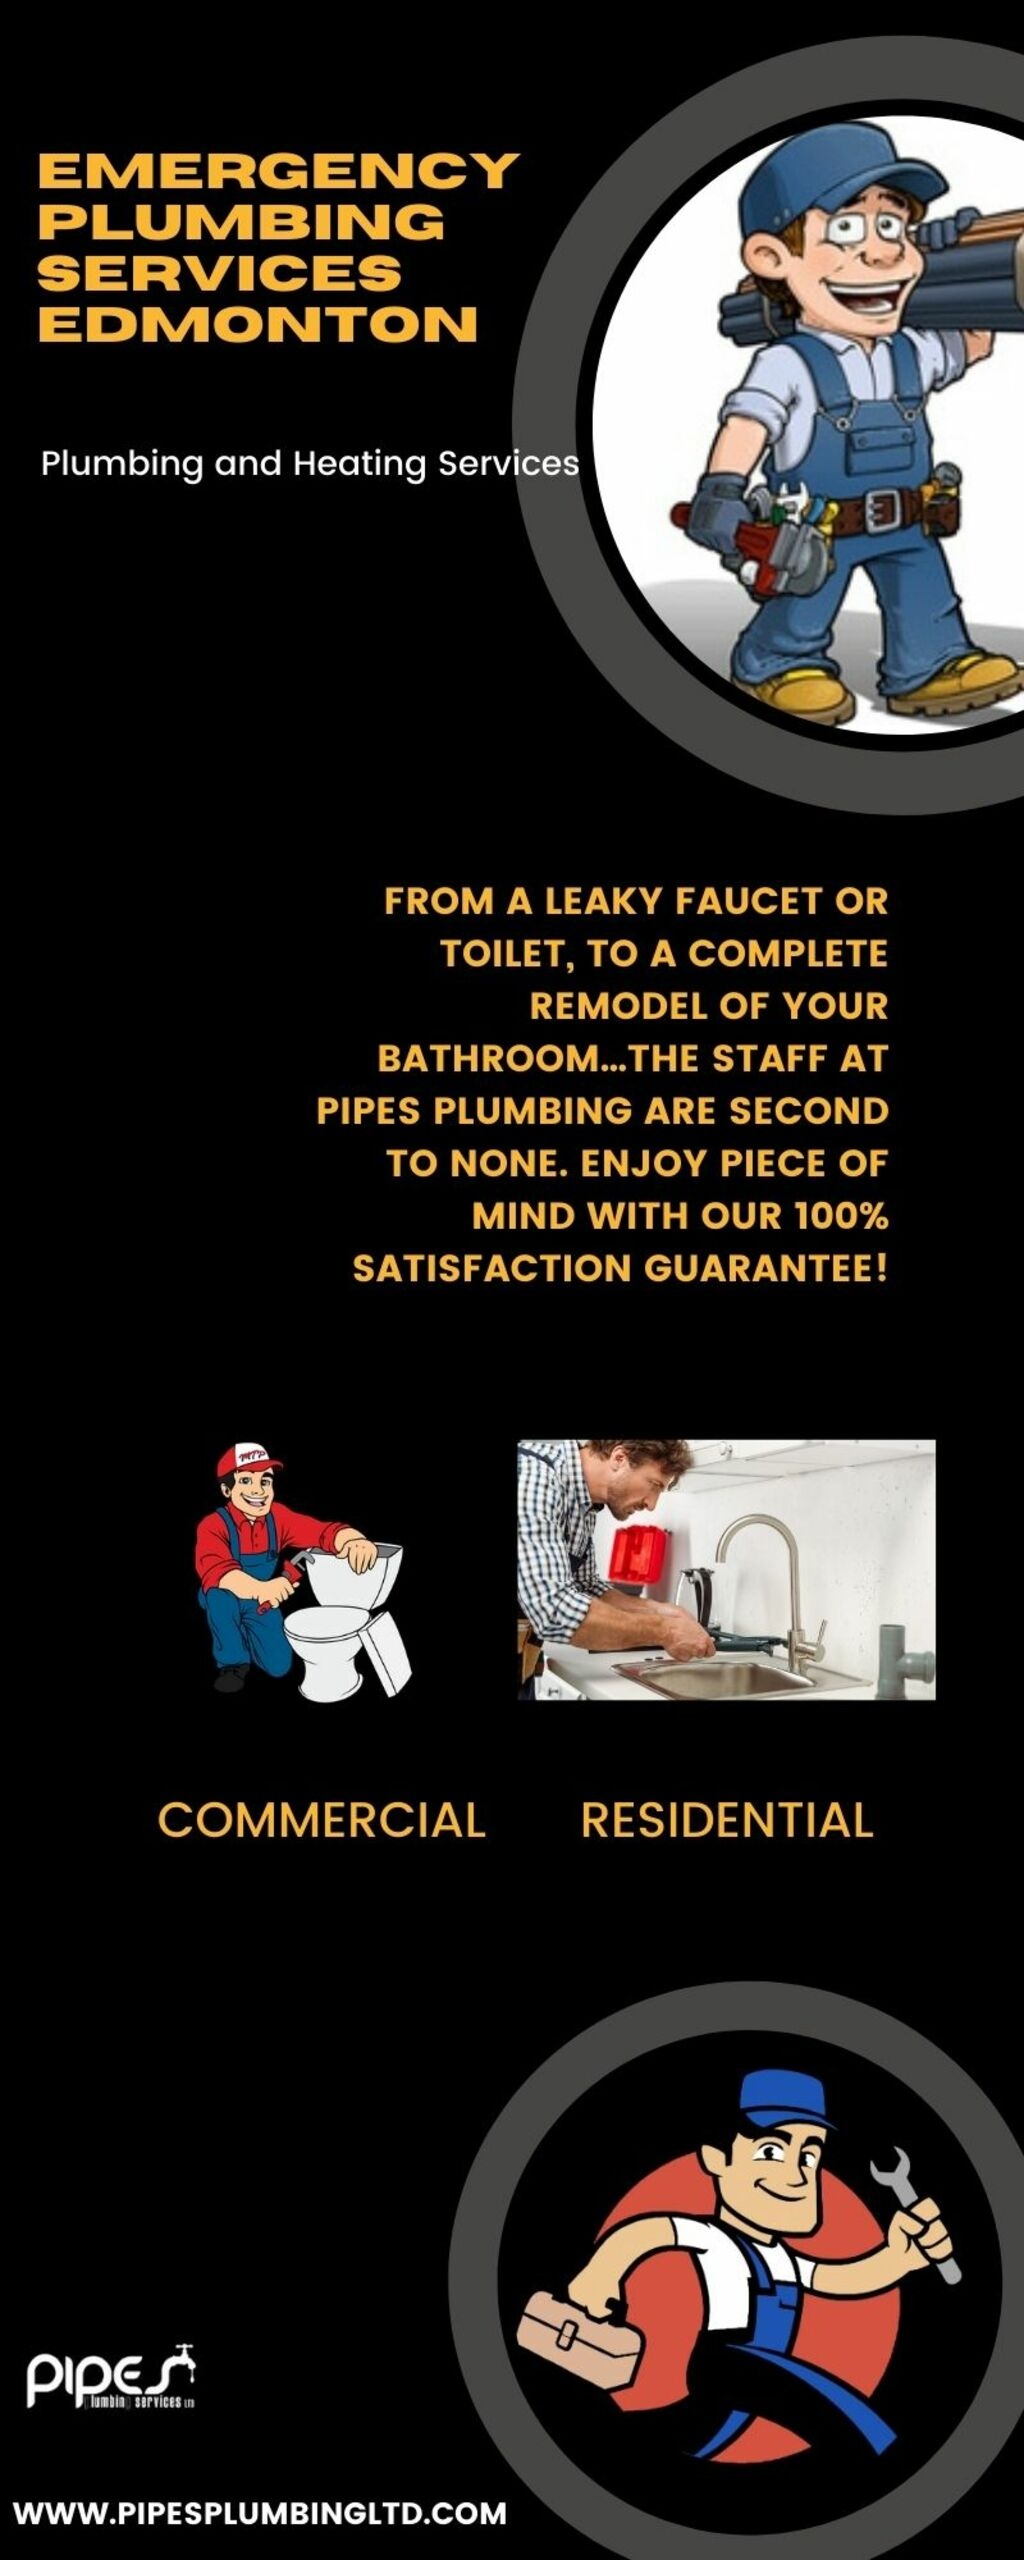 Emergency Plumbing Services in Edmonton via Pipes Plumbing